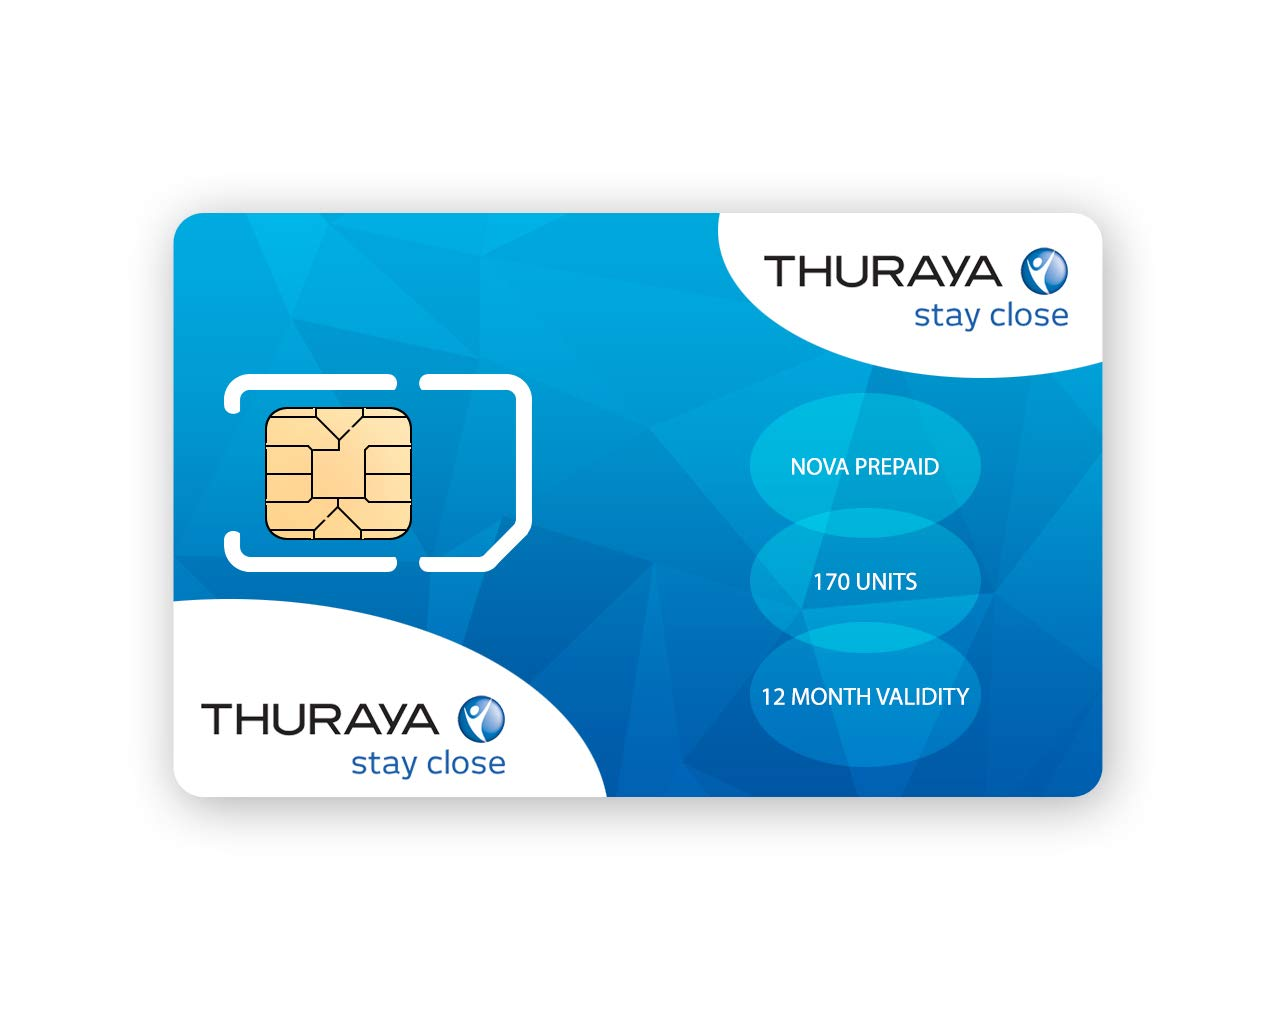 Thuraya Satellite Phone NOVA SIM with 170 Units (200 Minutes)